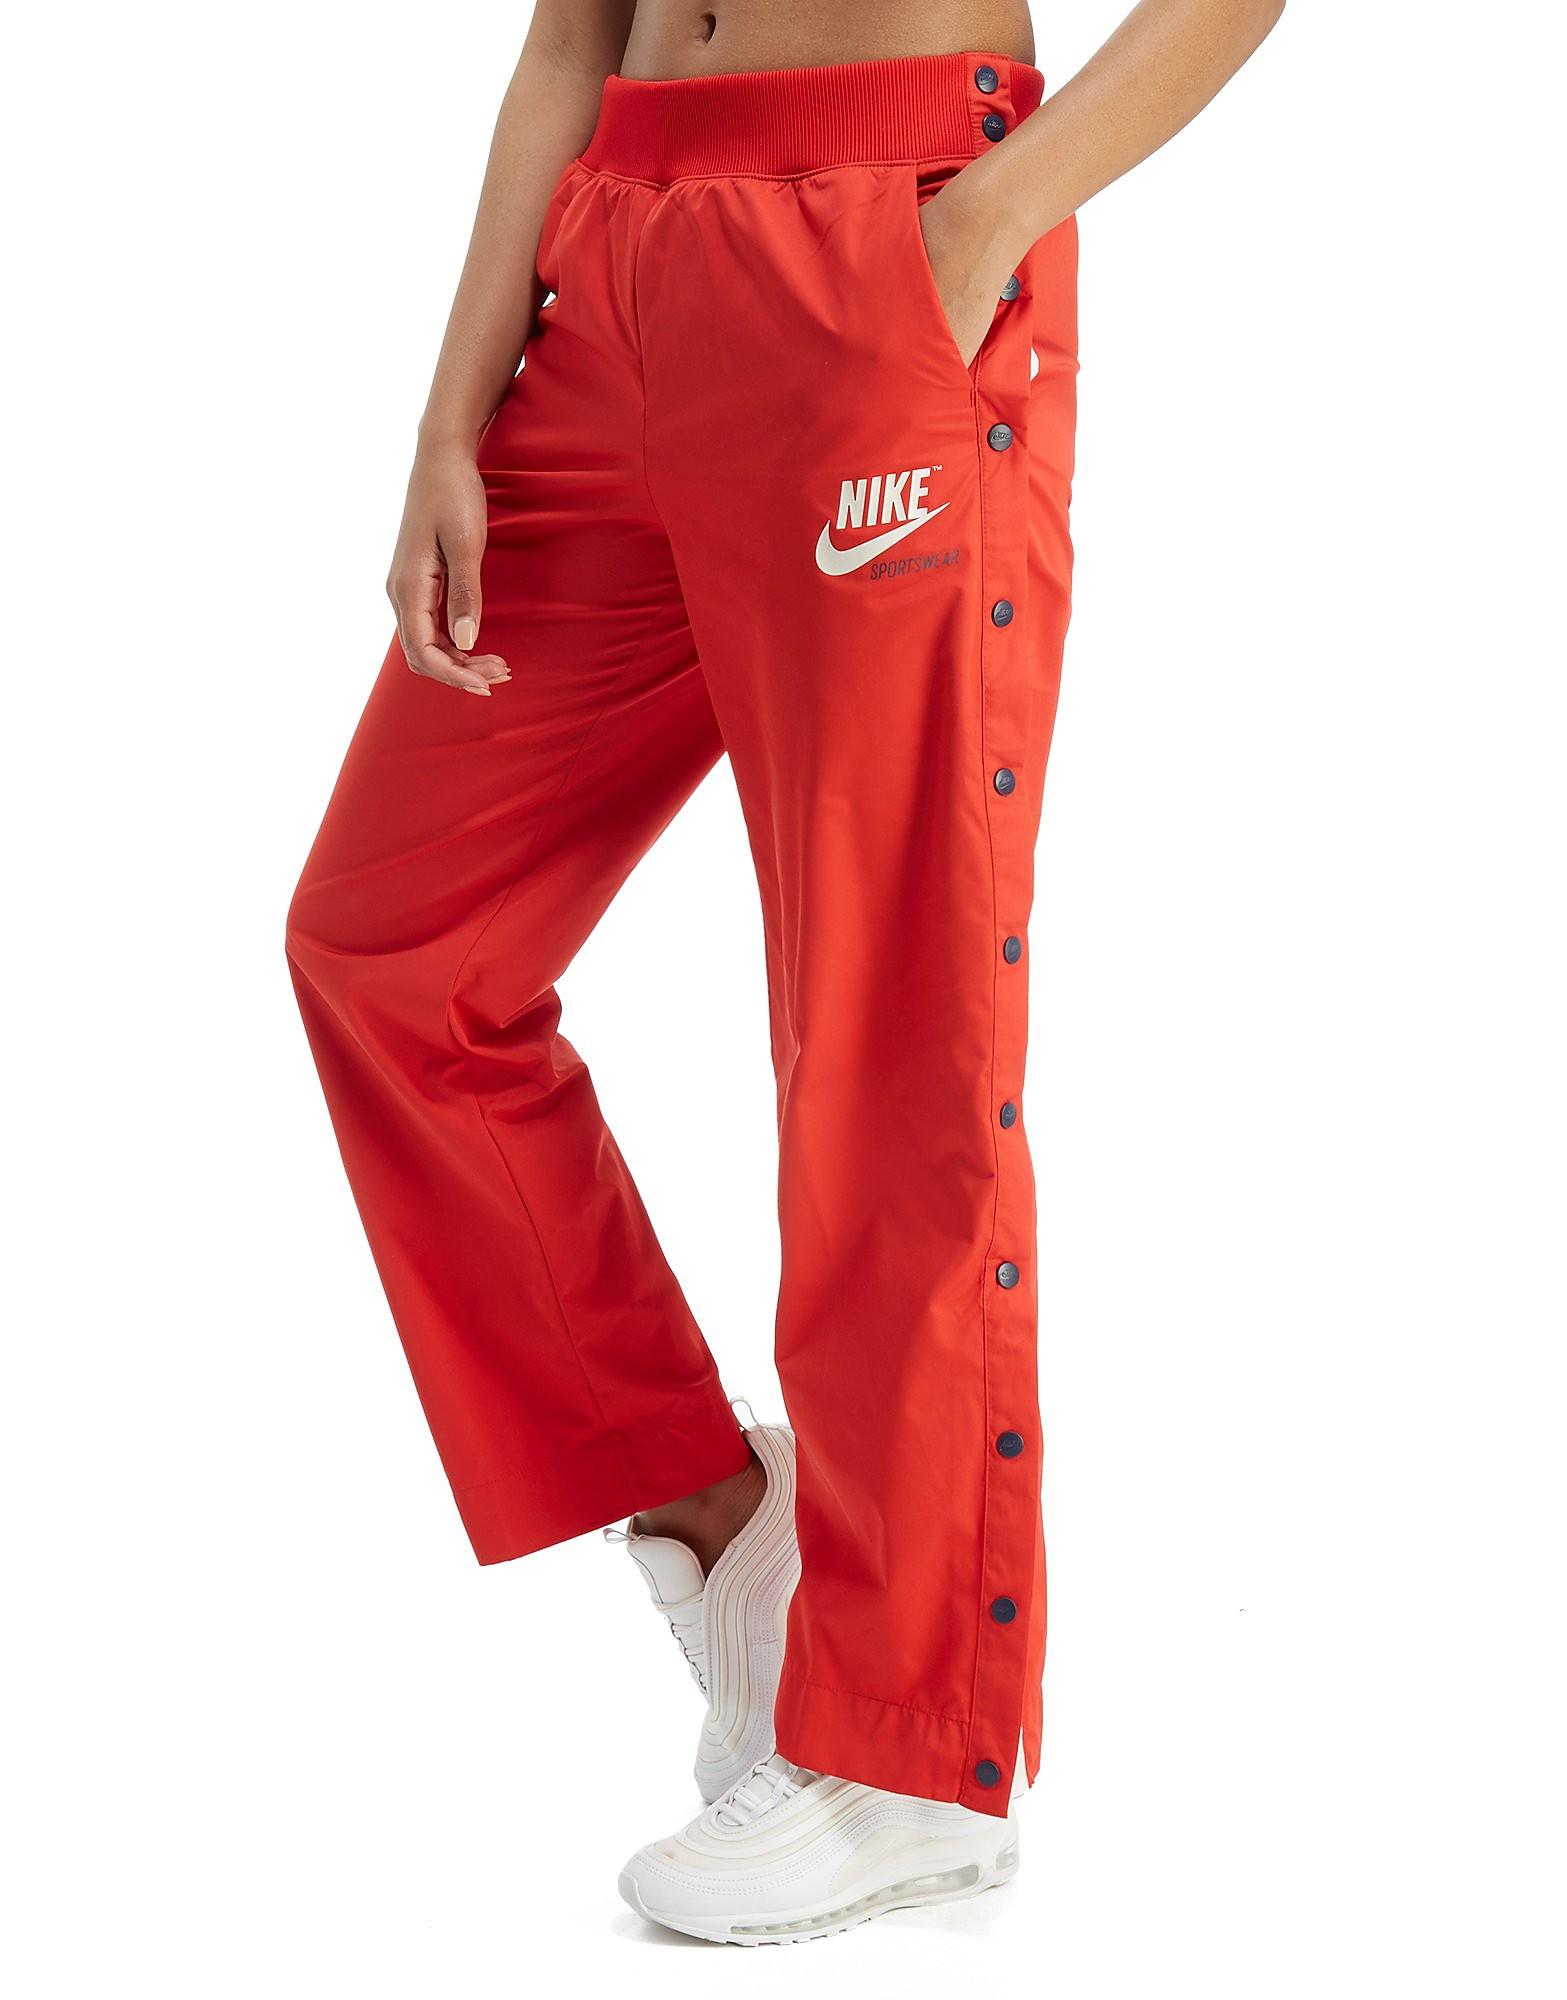 Nike pantalón Archive Snap